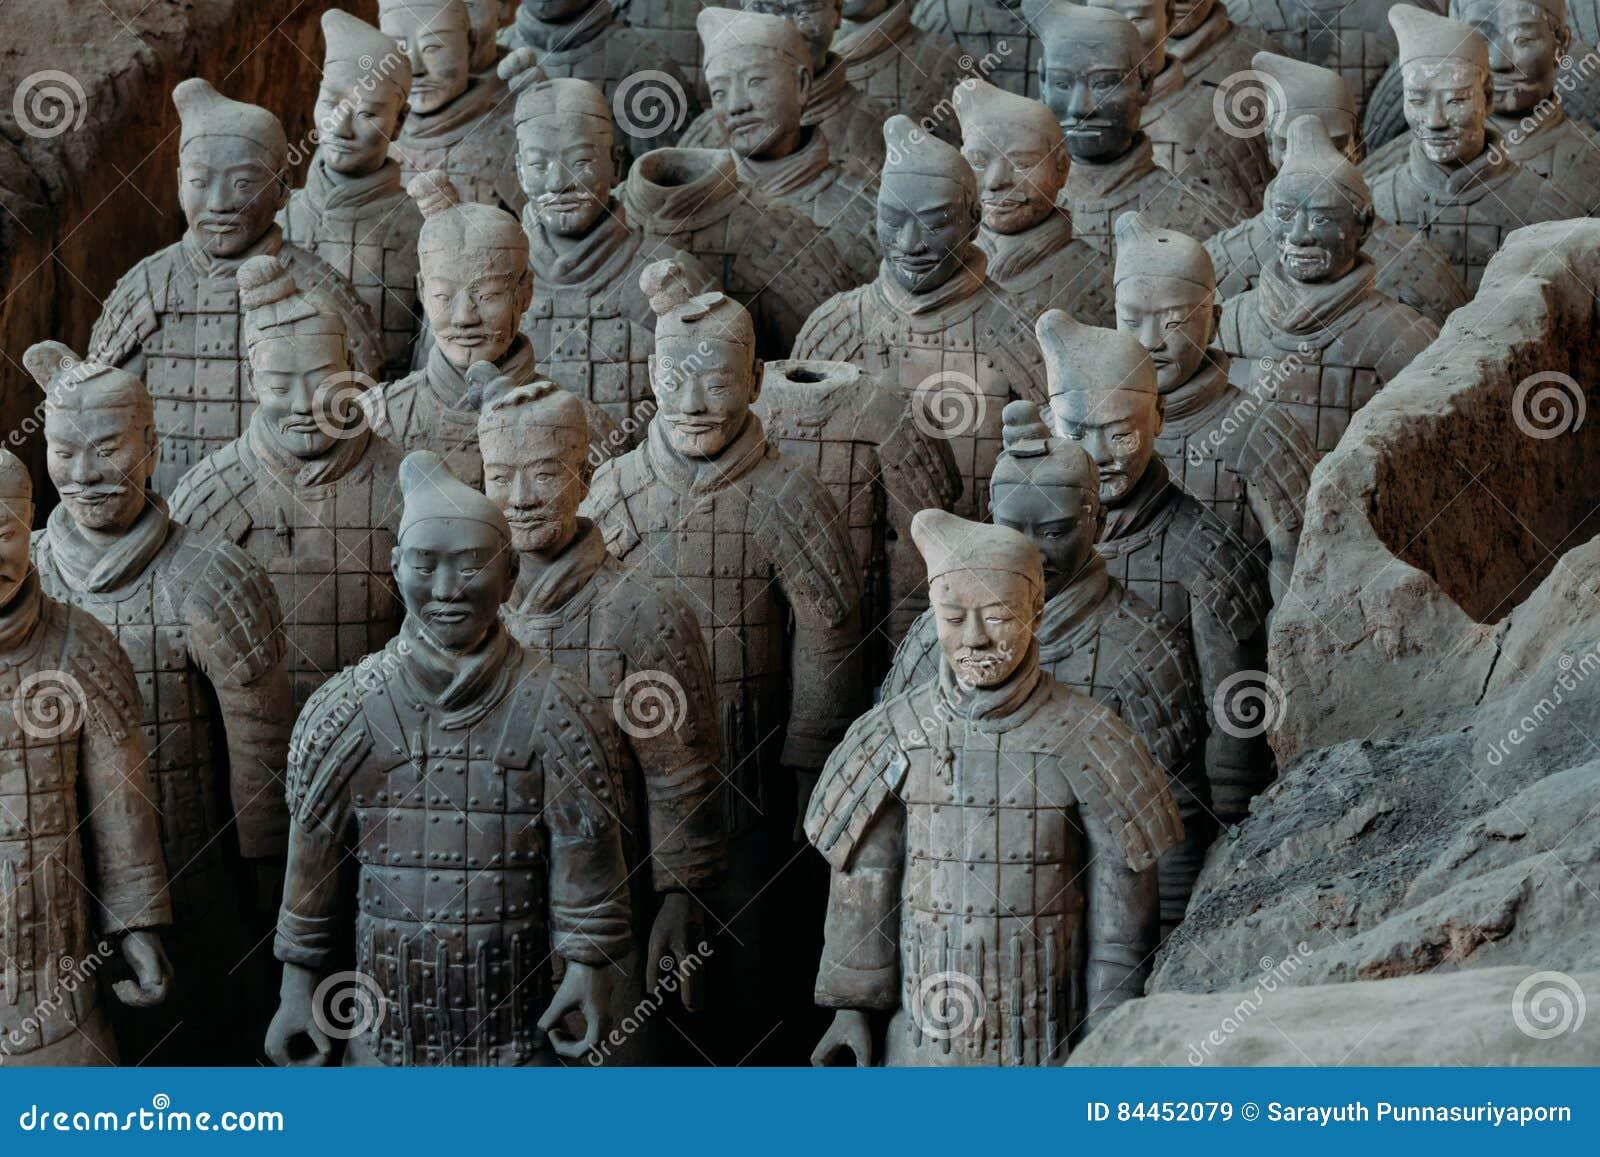 Nahaufnahme der berühmten Terrakotta-Armee der Krieger in Xian, China